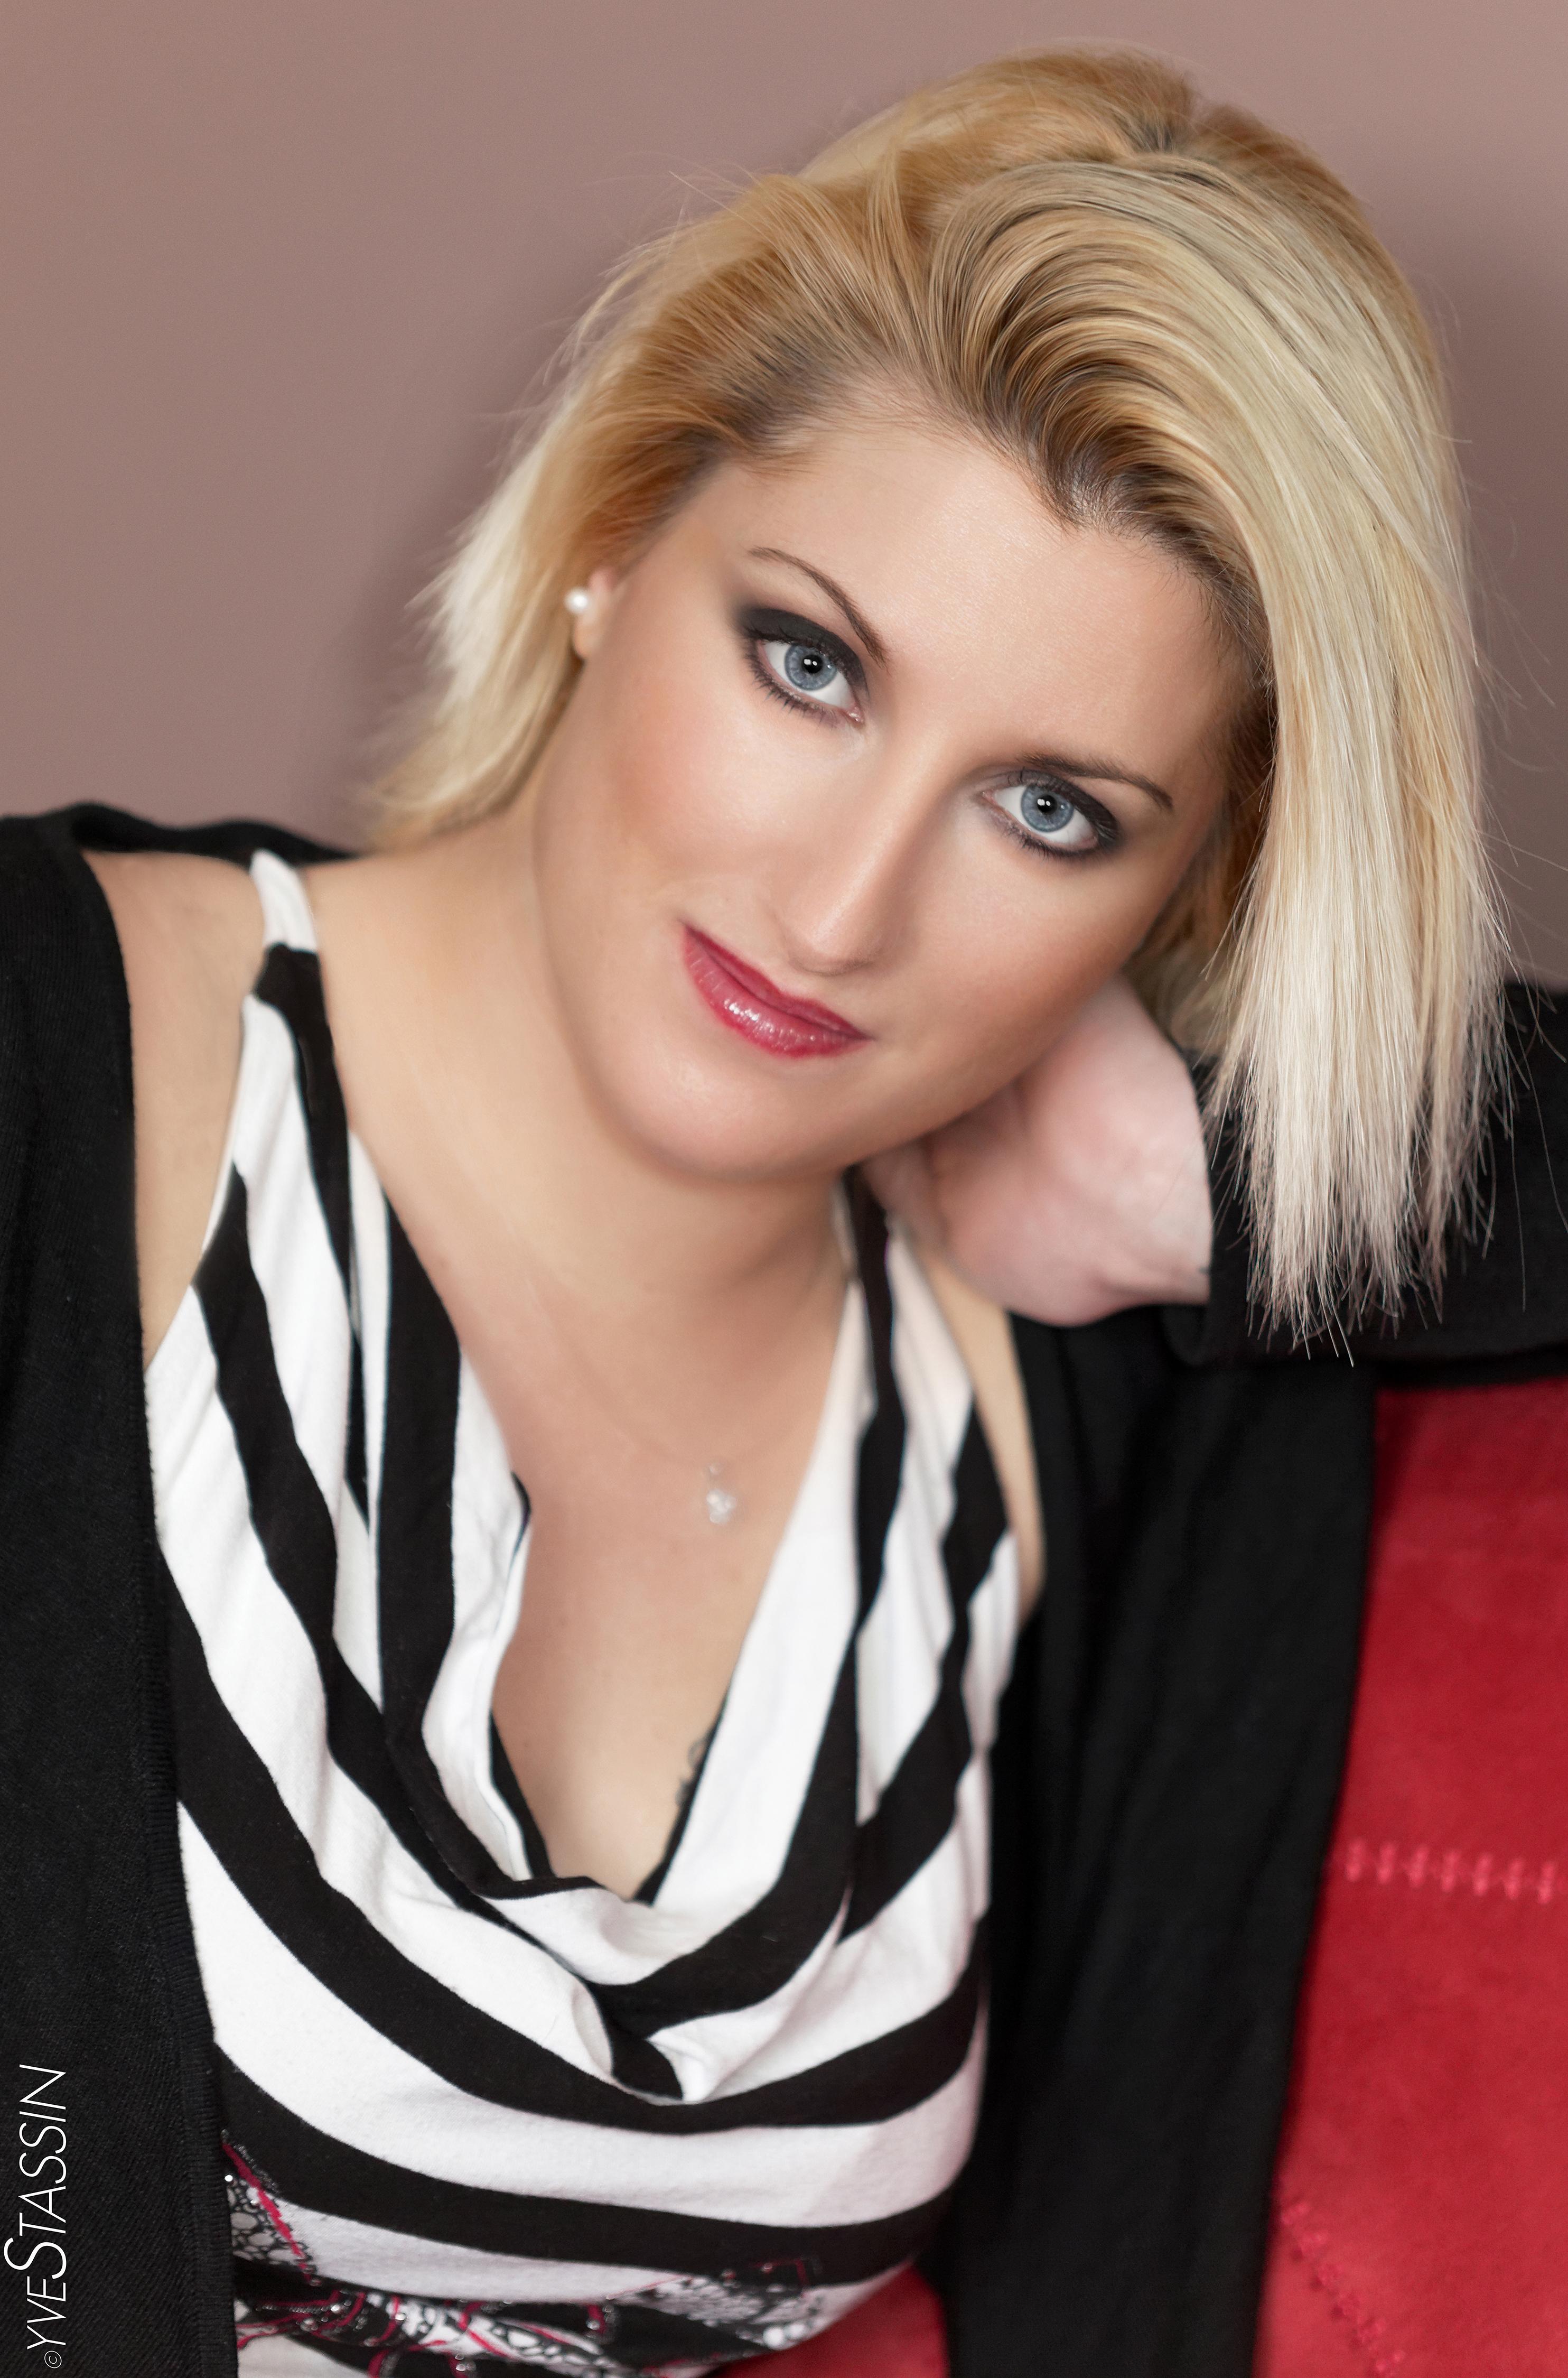 Jess Lebon